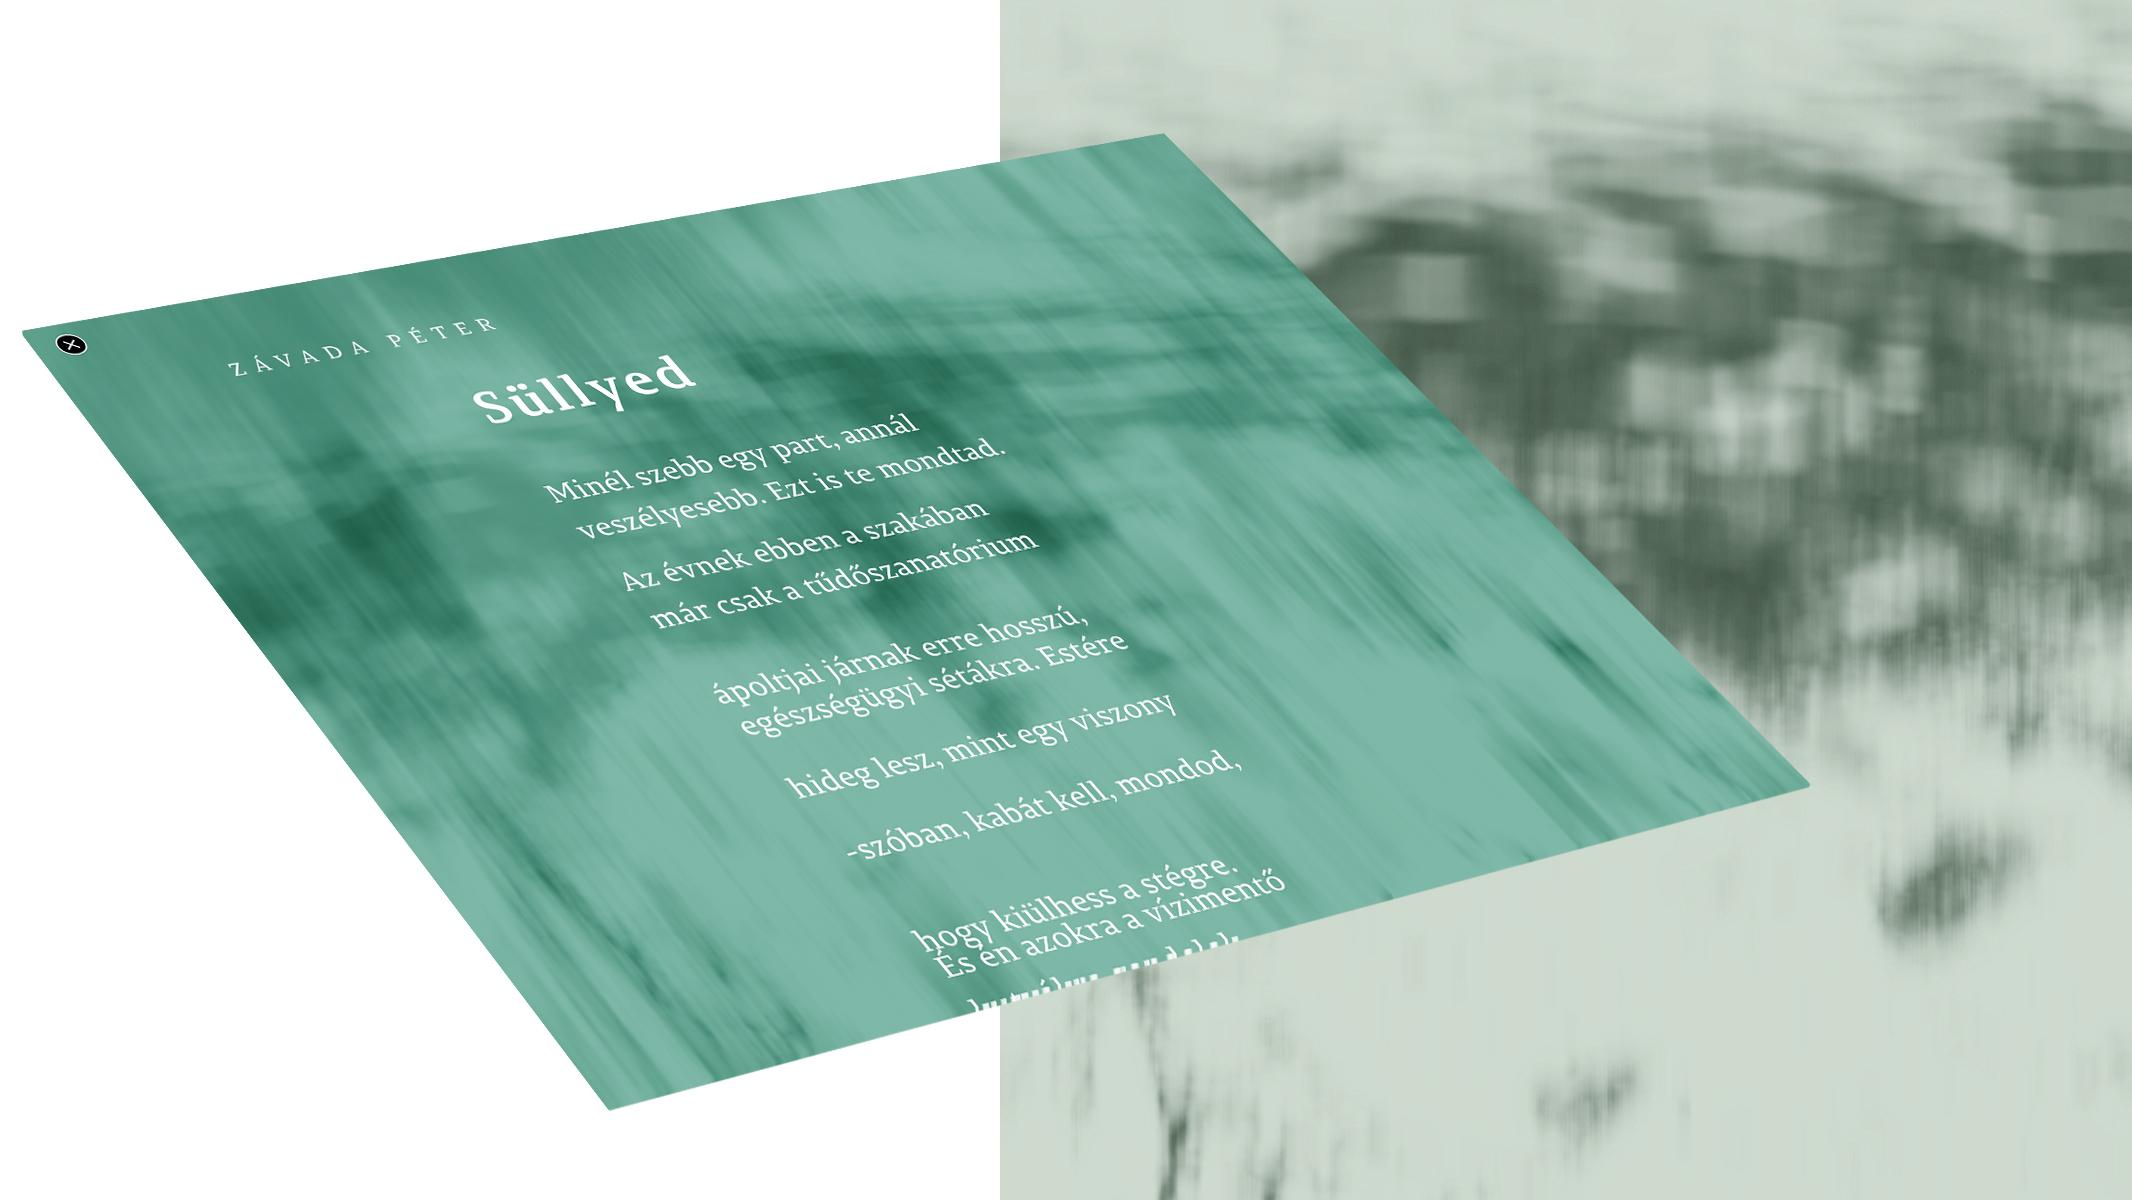 emlekek-tava-2132x1200-015